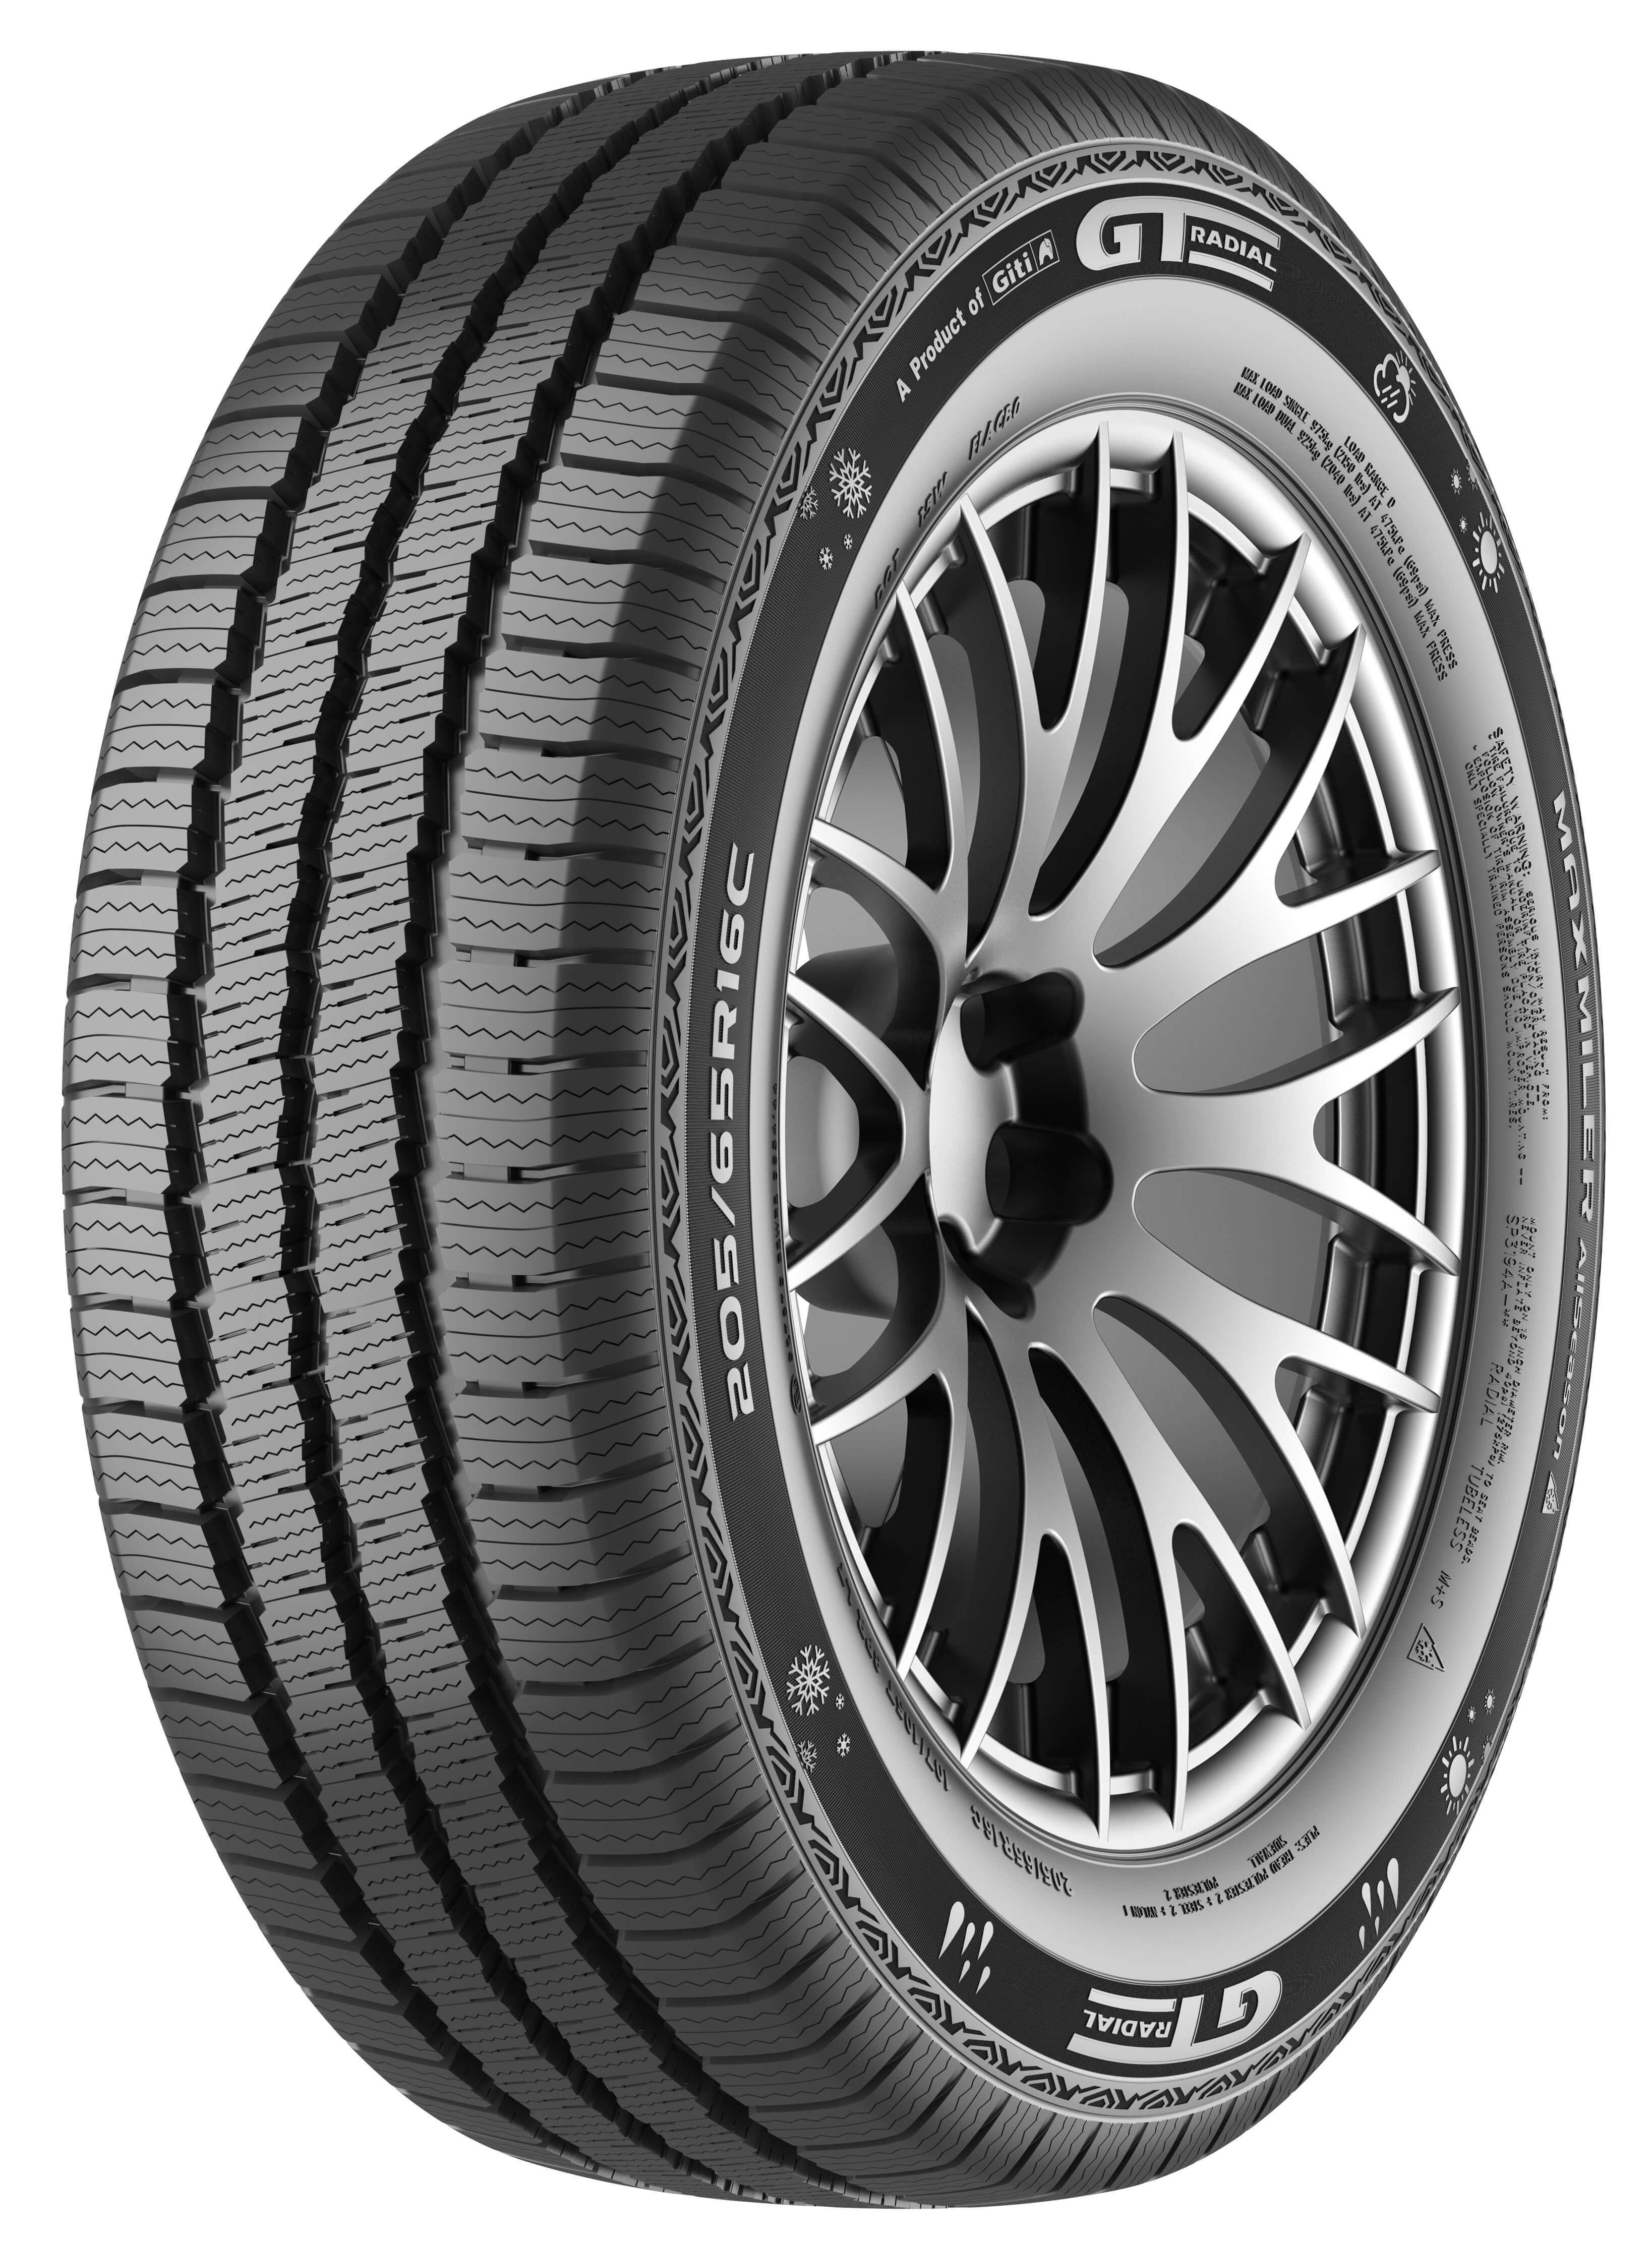 Maxmiler AllSeason tyre image